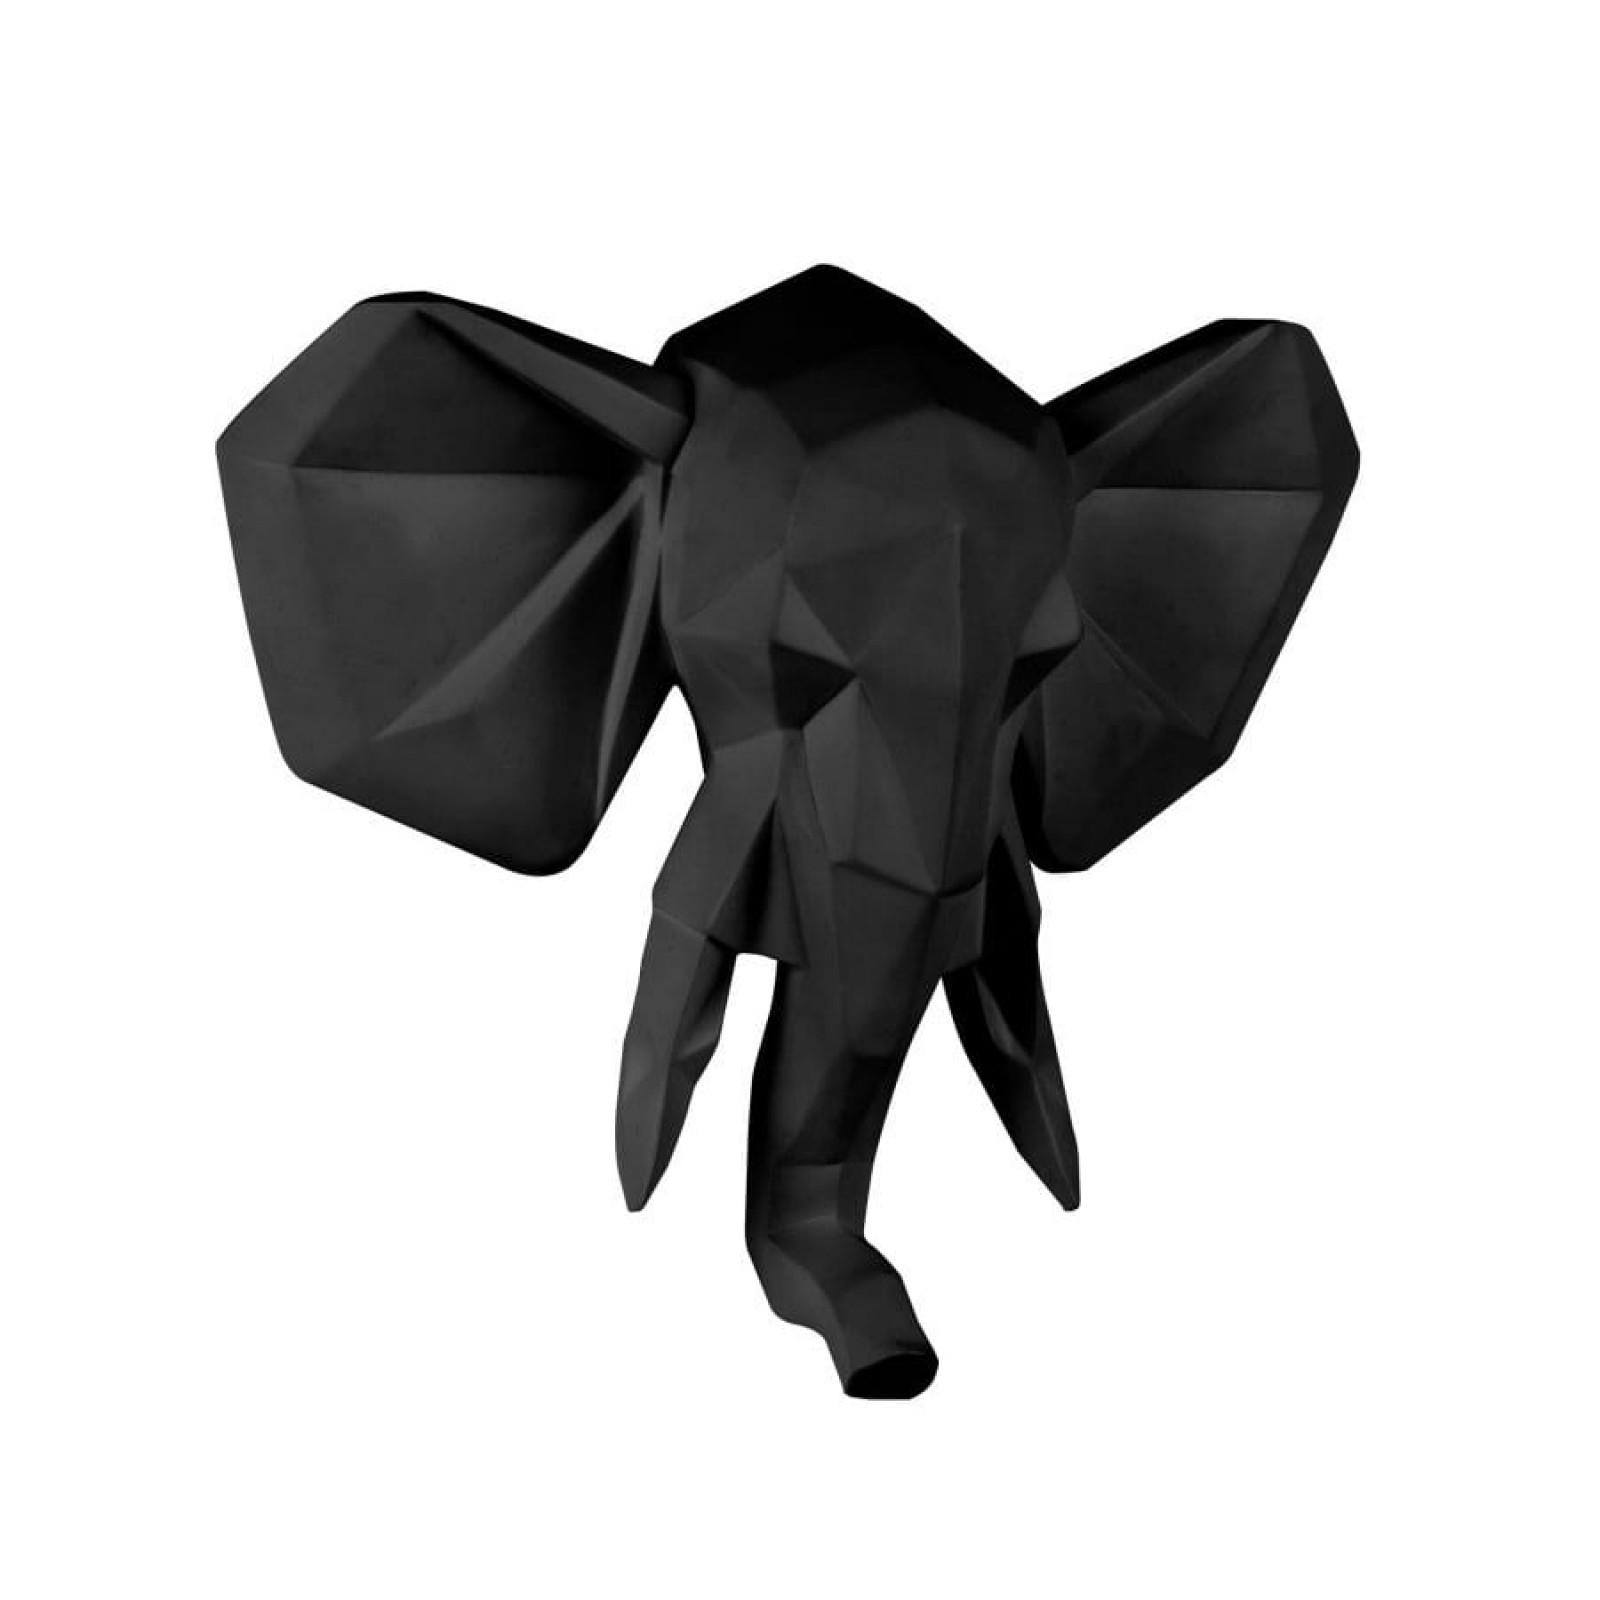 Origami Elephant Wall Hanger (Matt Black) - Present Time